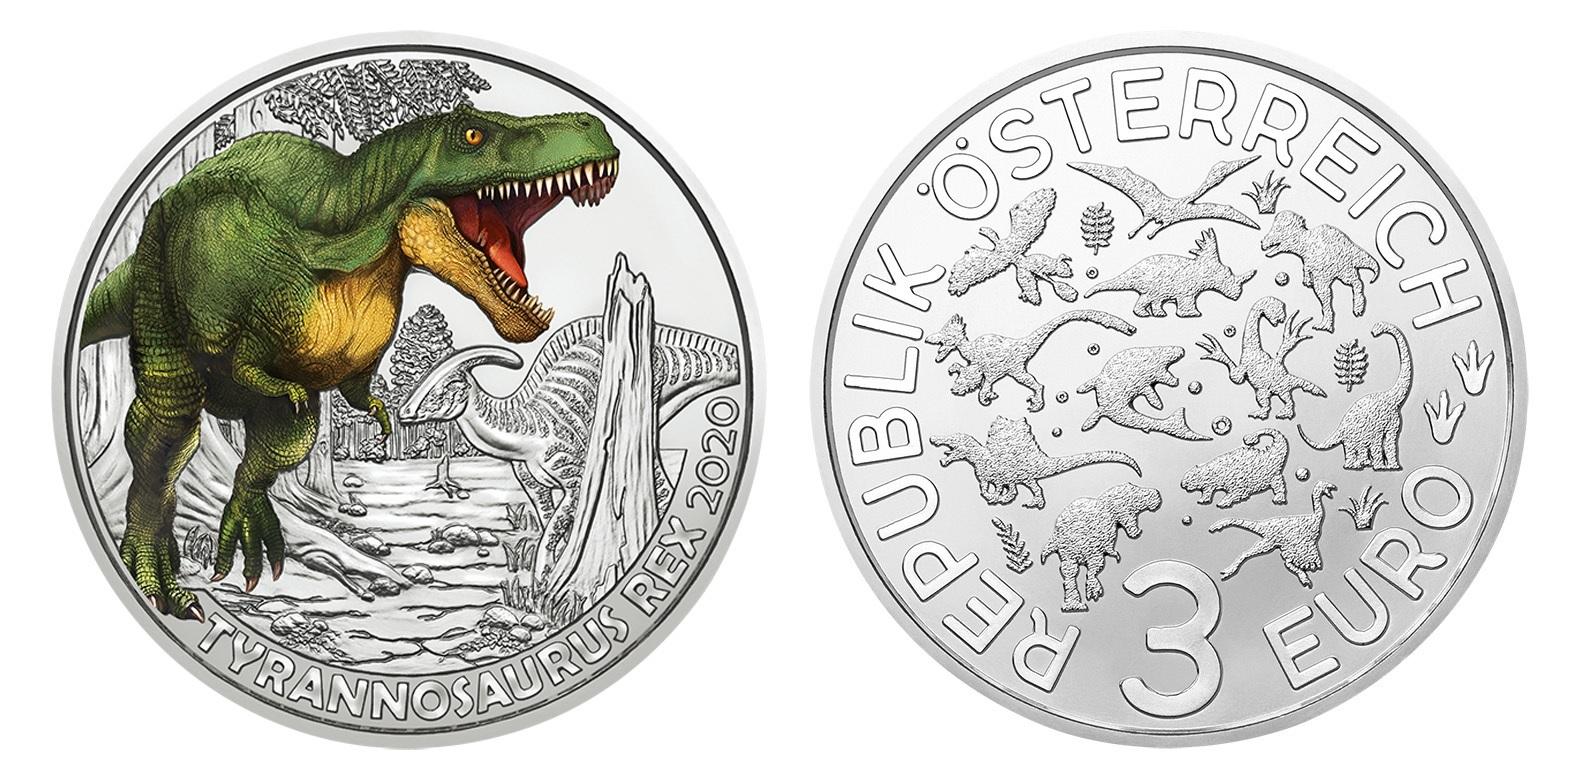 (EUR01.ComBU&BE.2020.300.24597) 3 euro Austria 2020 - Tyrannosaurus Rex (zoom)